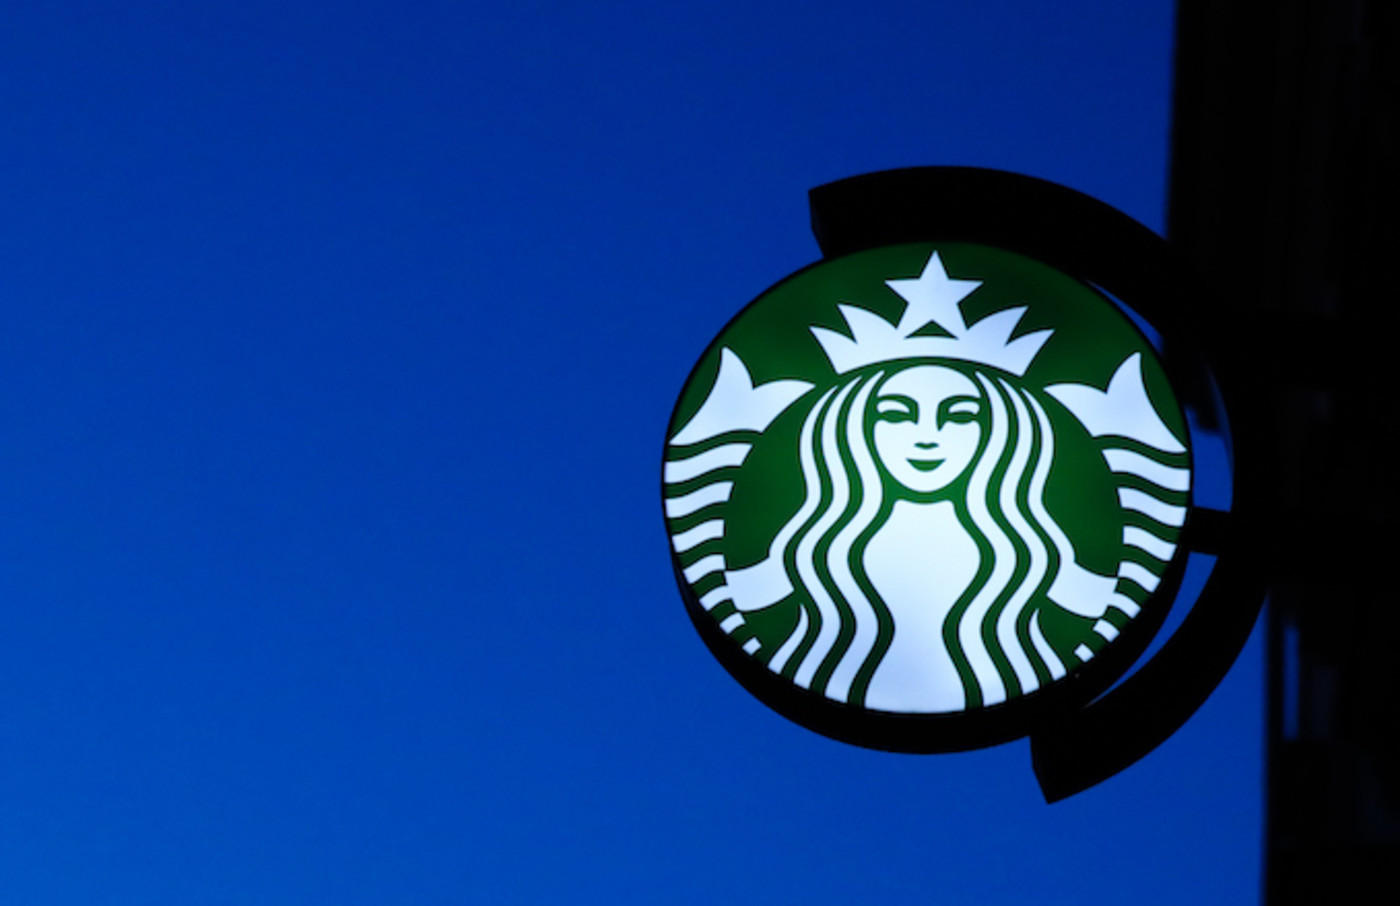 Starbucks Coffee logo is seen in Krakow , Poland.